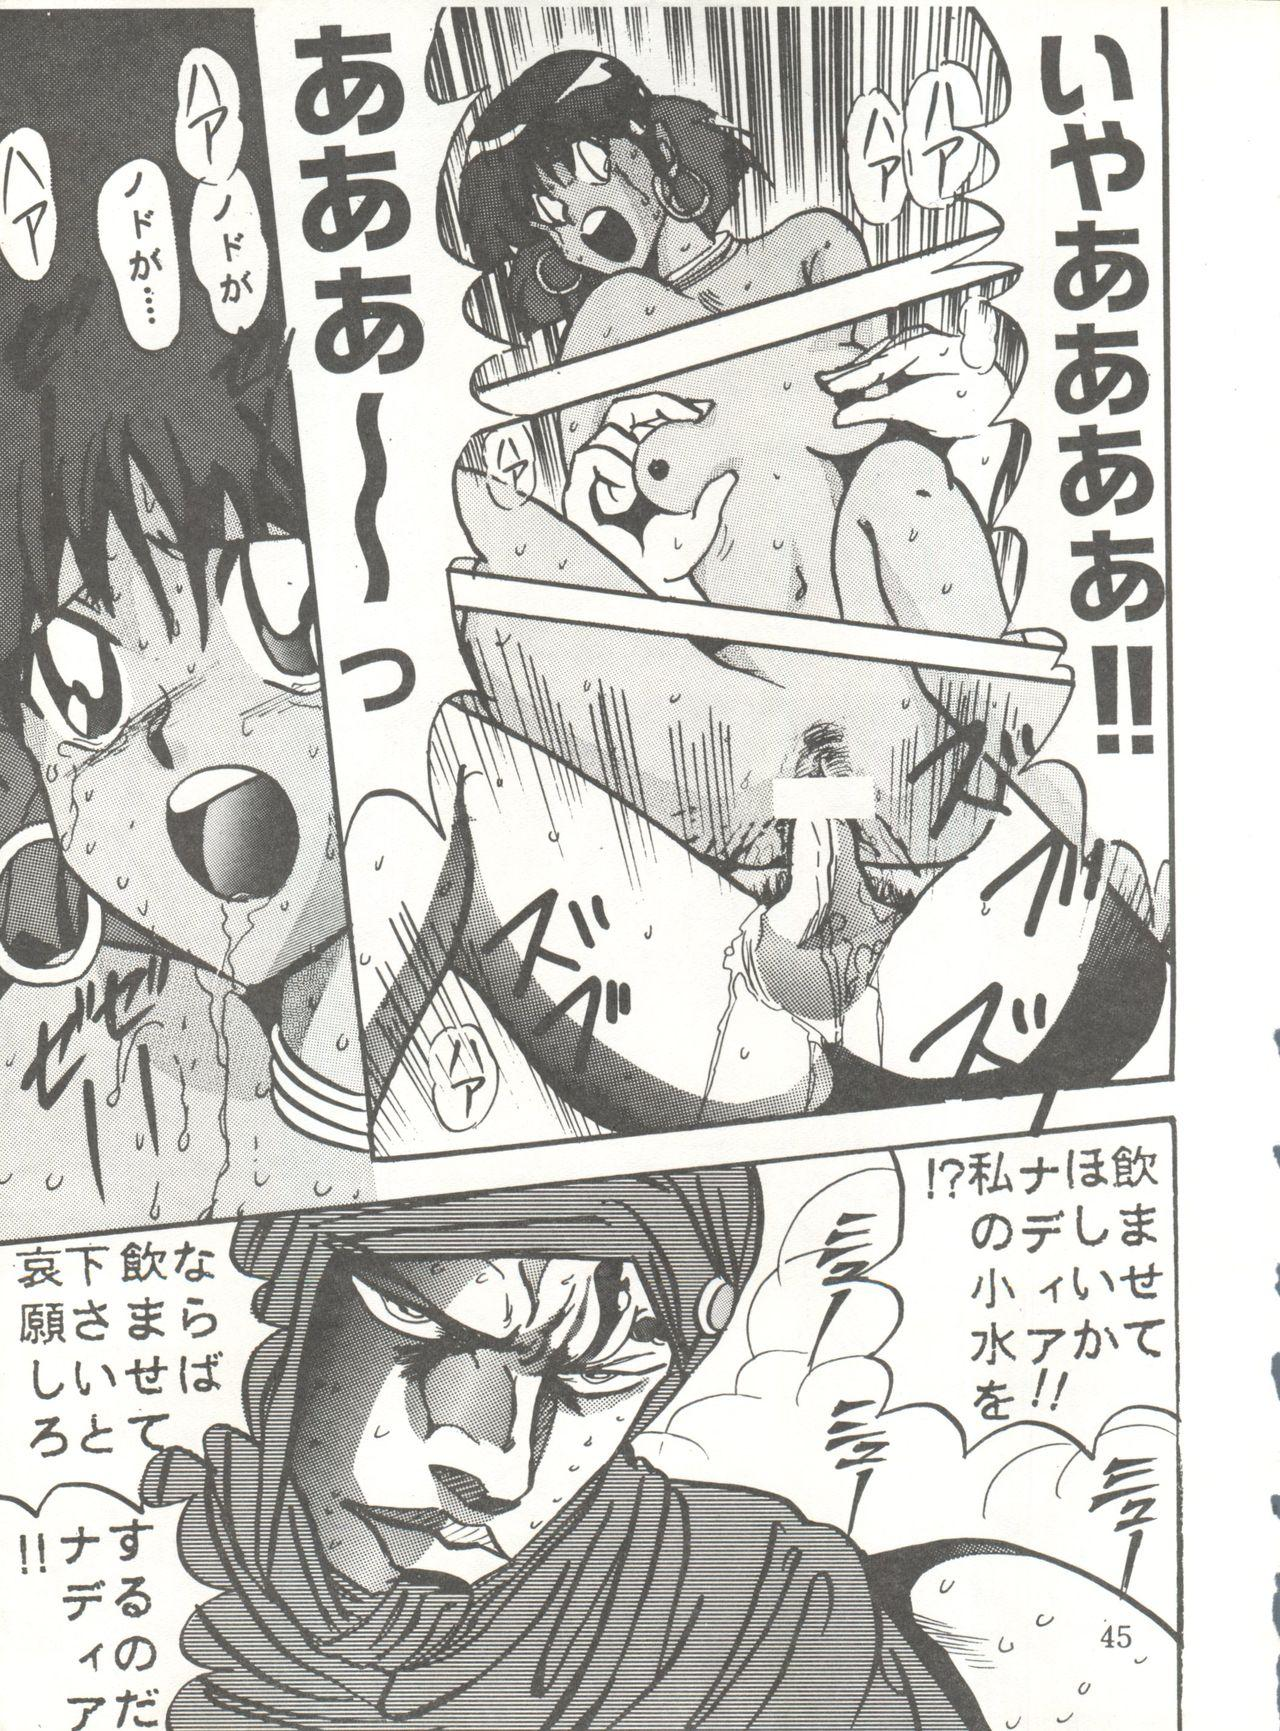 [Global One (MARO)] Sadistic 5 (Cutey Honey, Devilman, Sailor Moon), [Global One (MARO)] Sadistic (Dirty Pair, Fushigi no Umi no Nadia, Sailor Moon), [Studio Ikkatsumajin] .ribbon (Hime-chan's Ribbon) 104